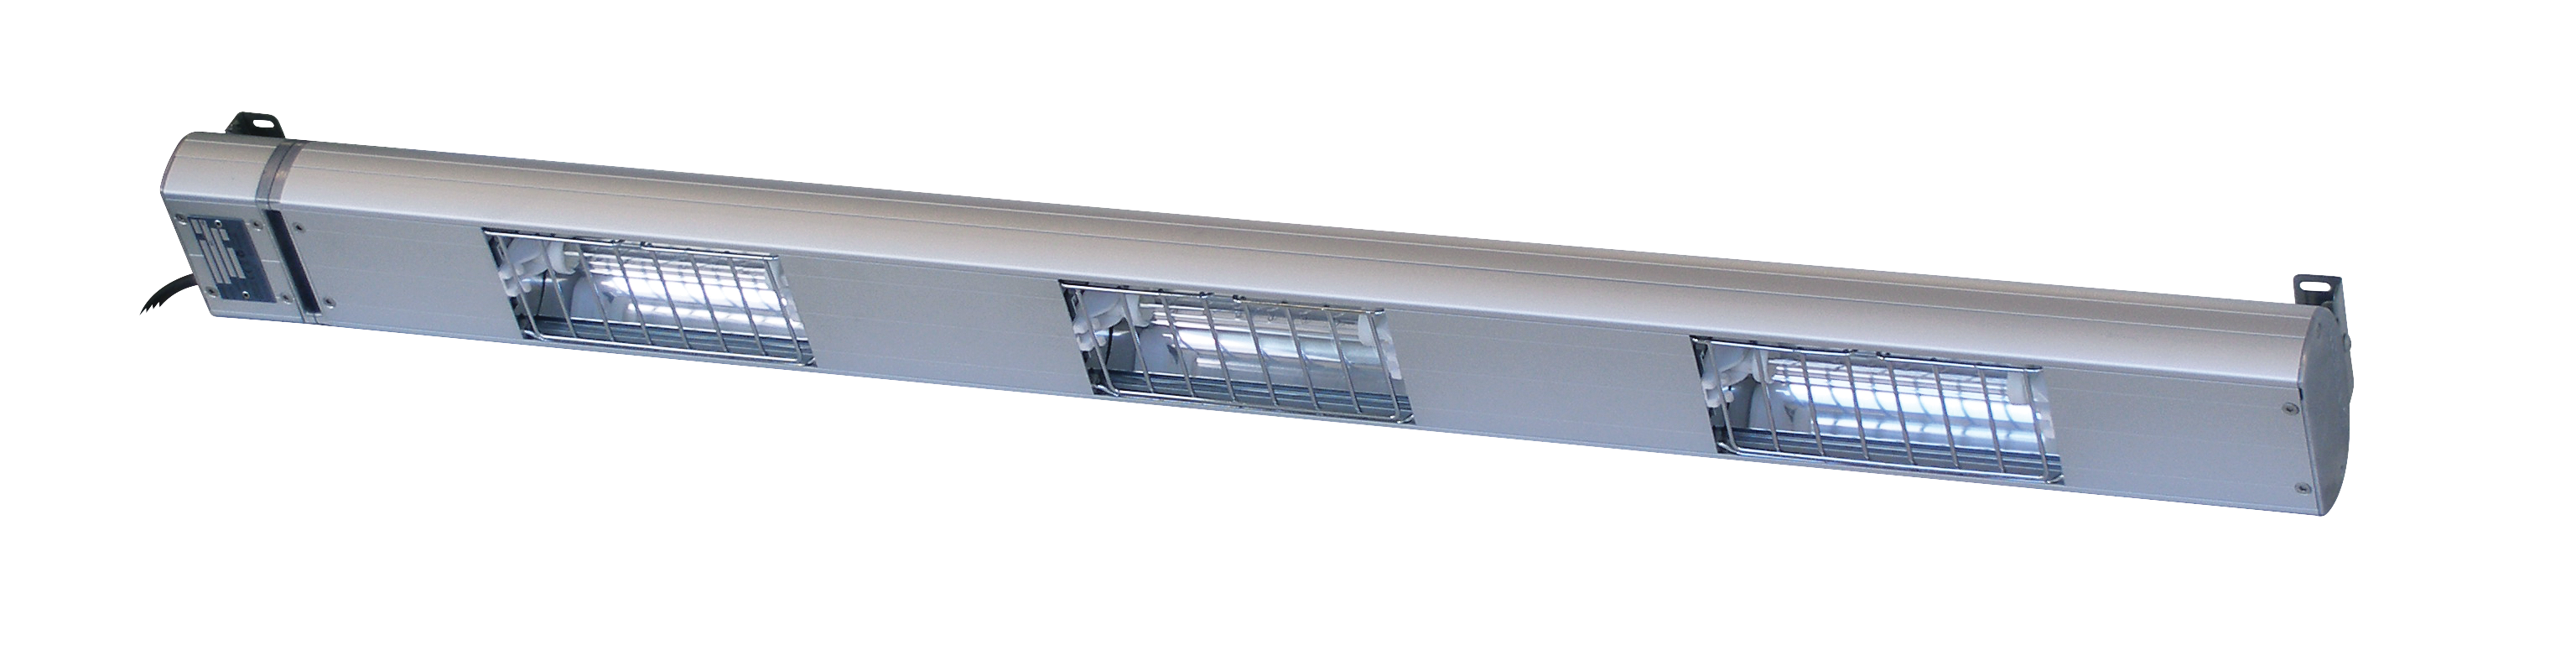 Quartz Heat Lamp Assemblies Lolsberg En